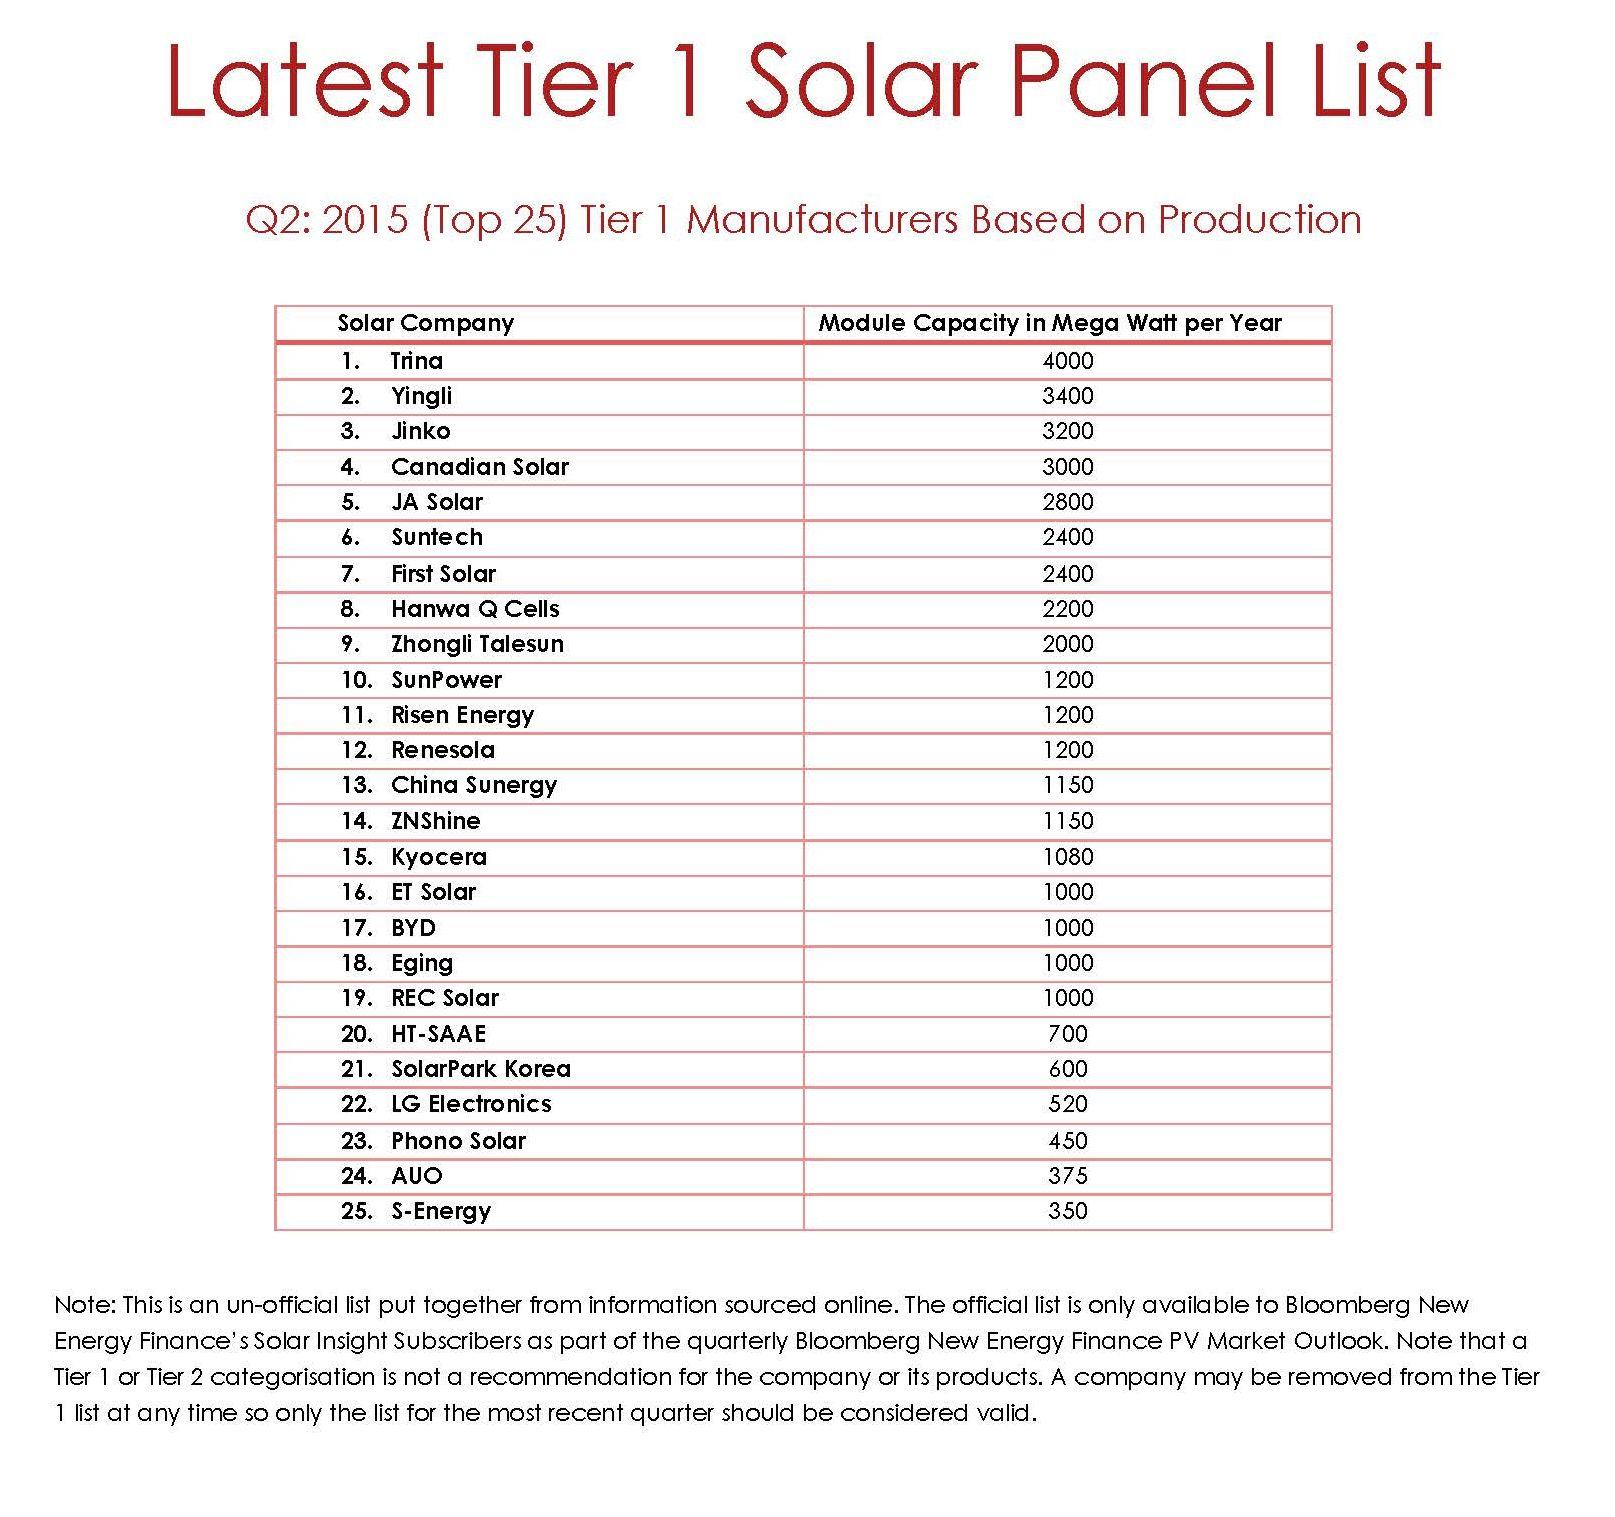 Q2 Tier 1 panel list 2015